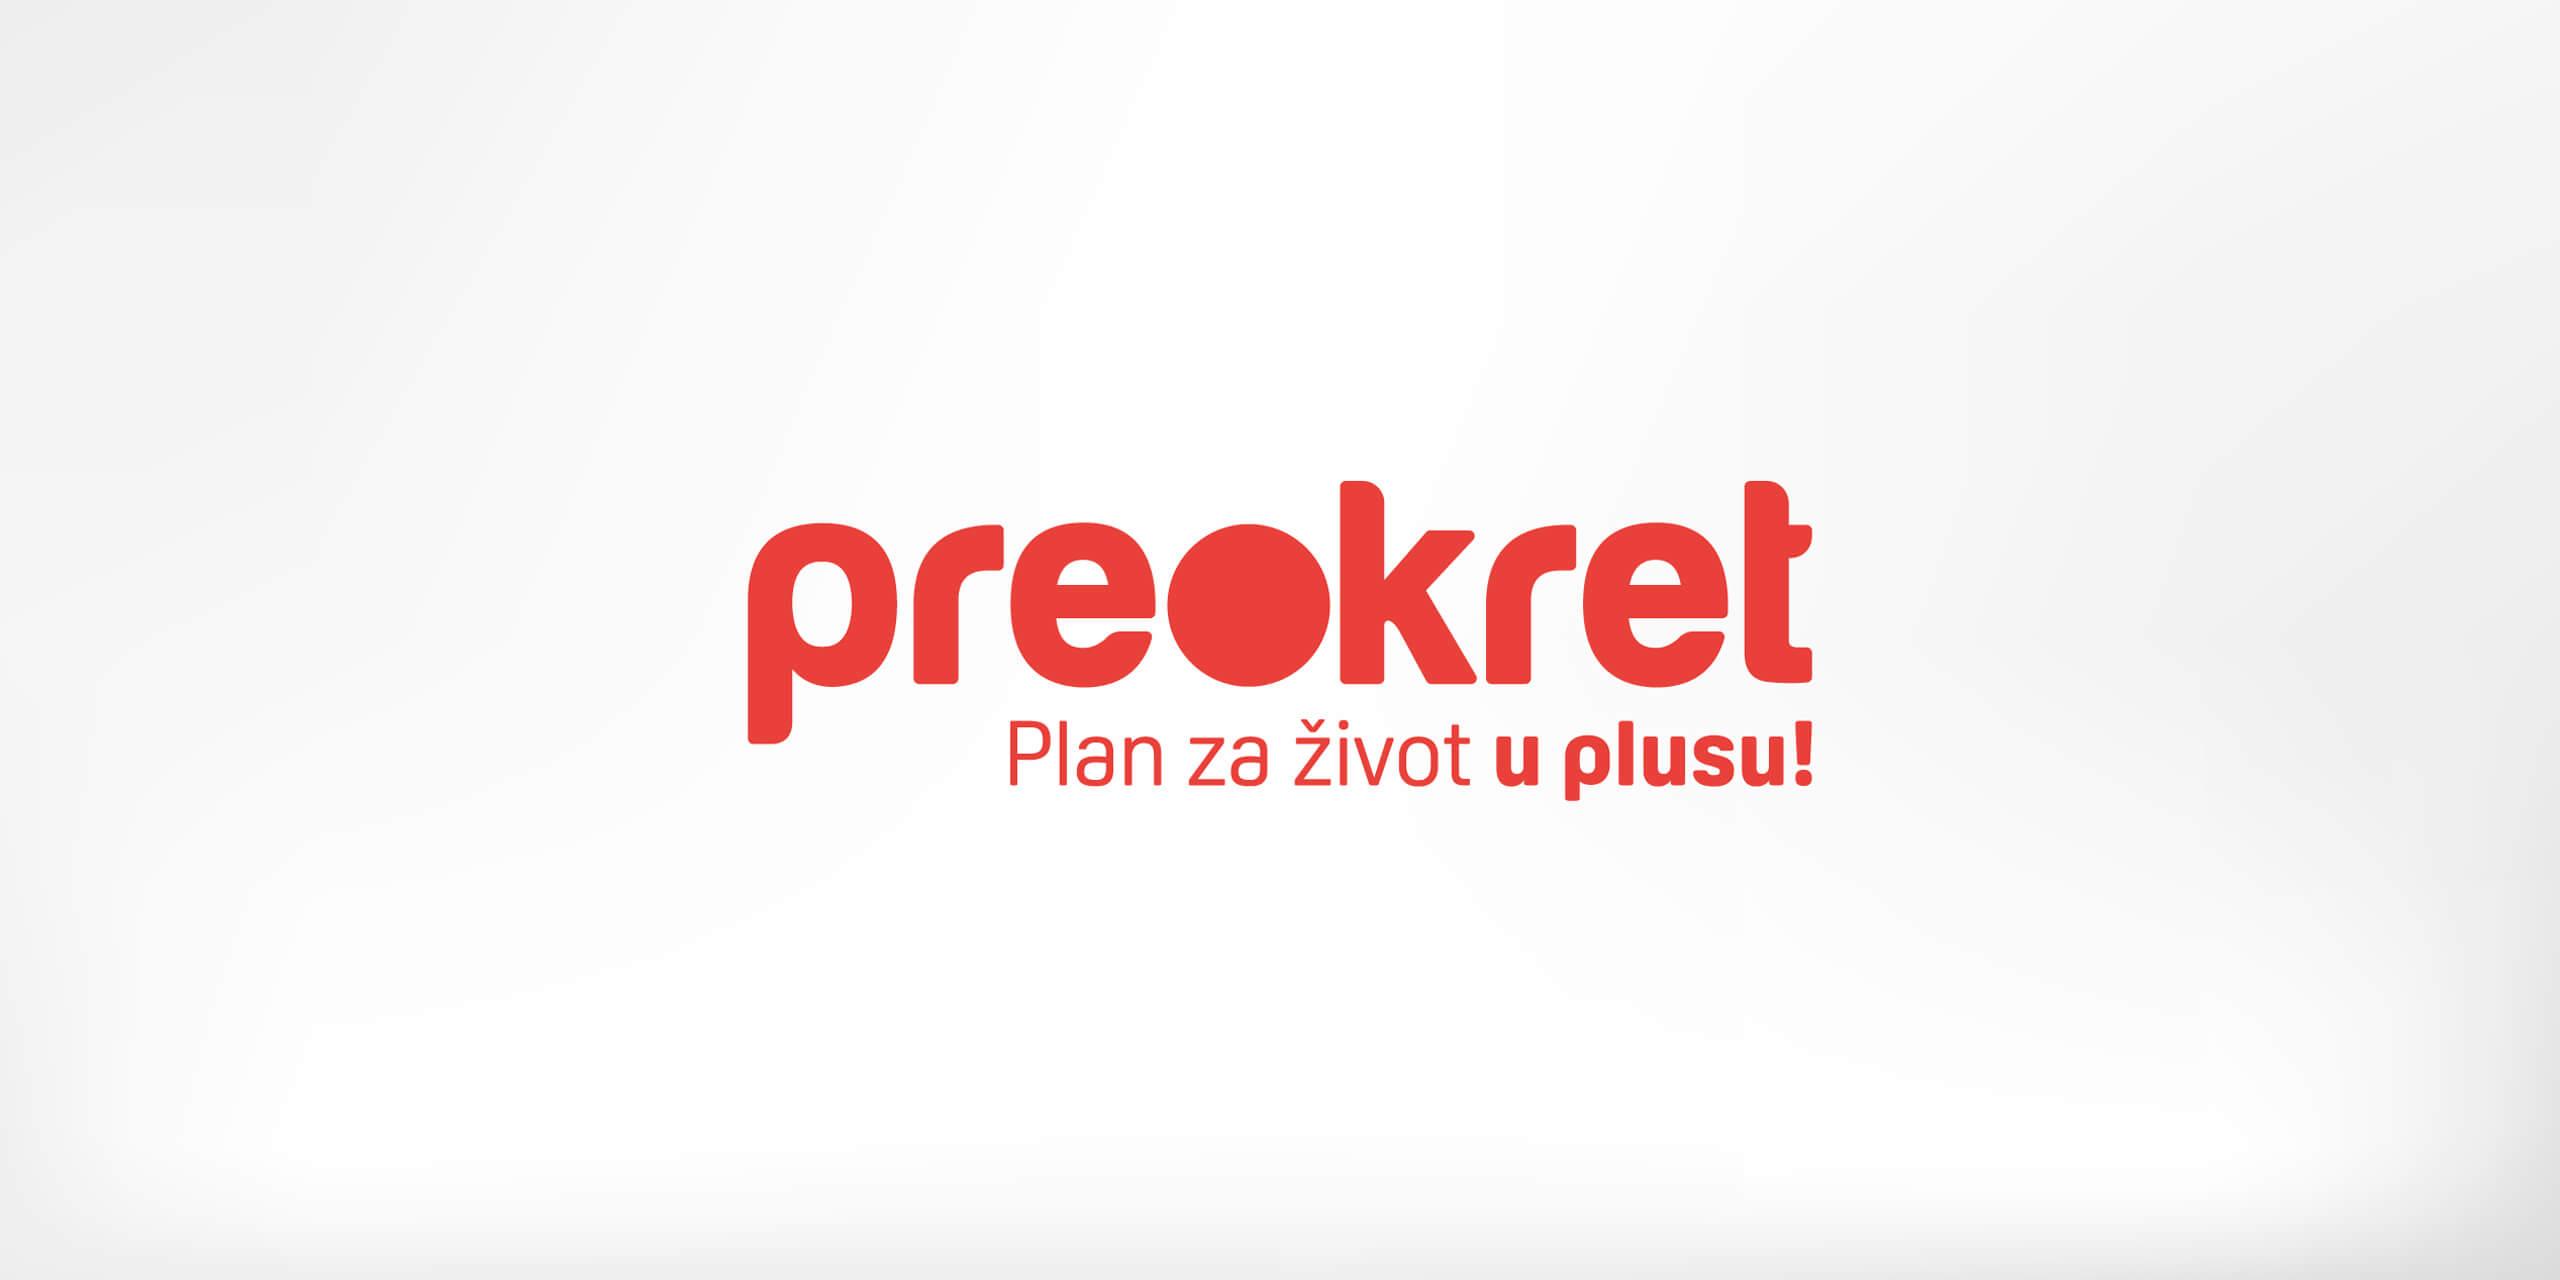 Preokret branding